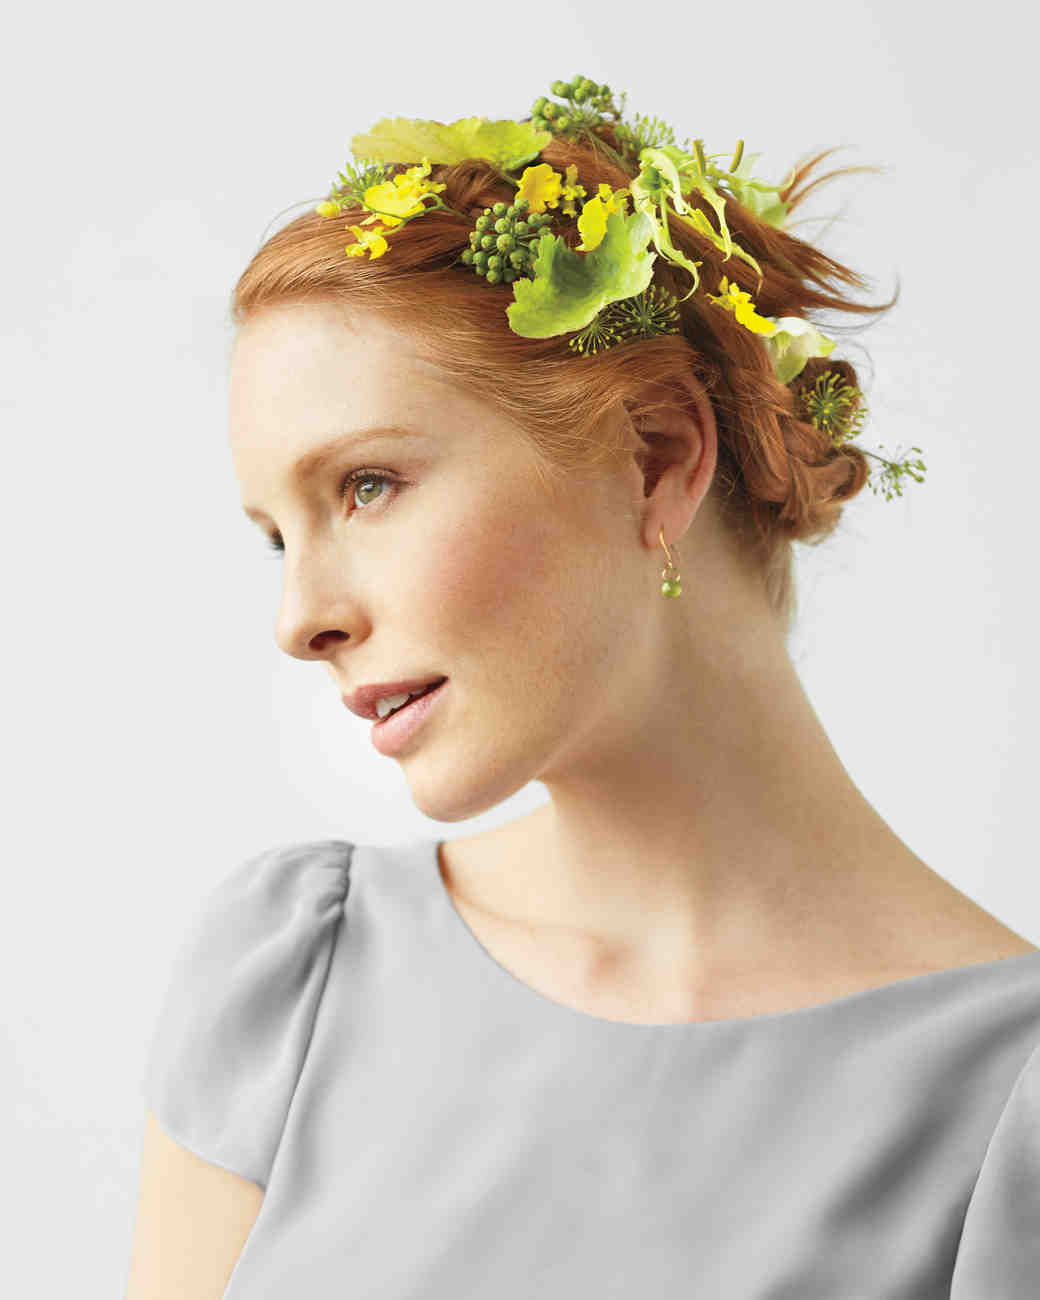 bridemaid-green-flower-hair-0337-d111712.jpg